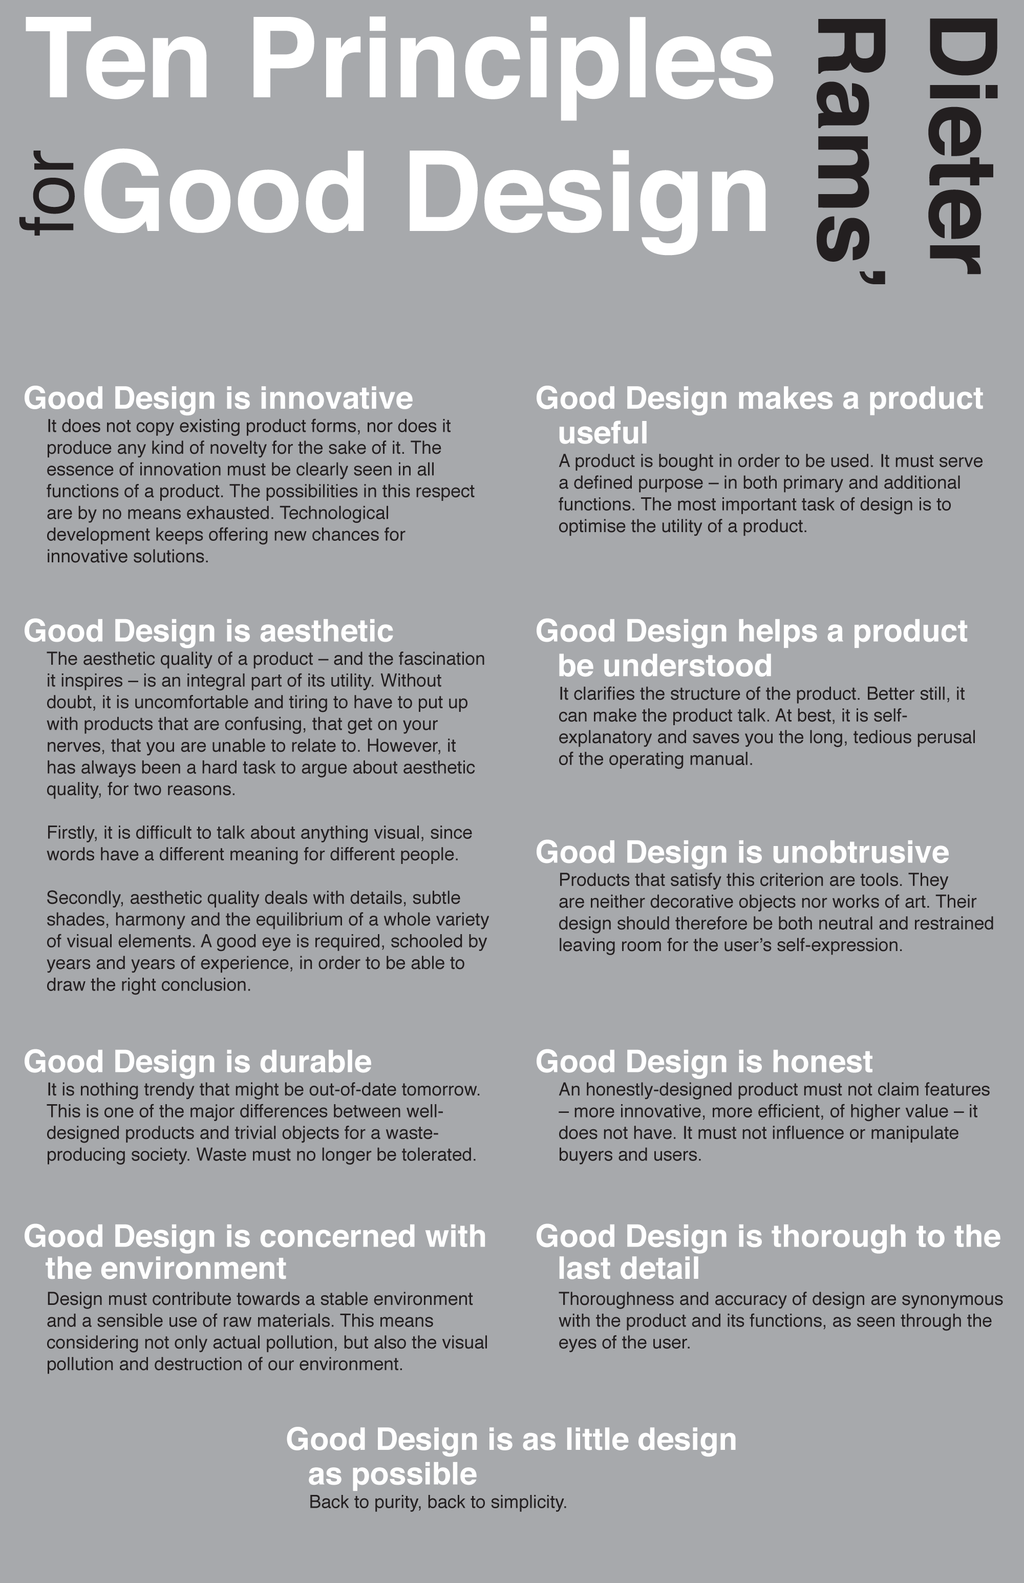 10 Principles For Good Design By Klitaka Sylfaen Design Theory